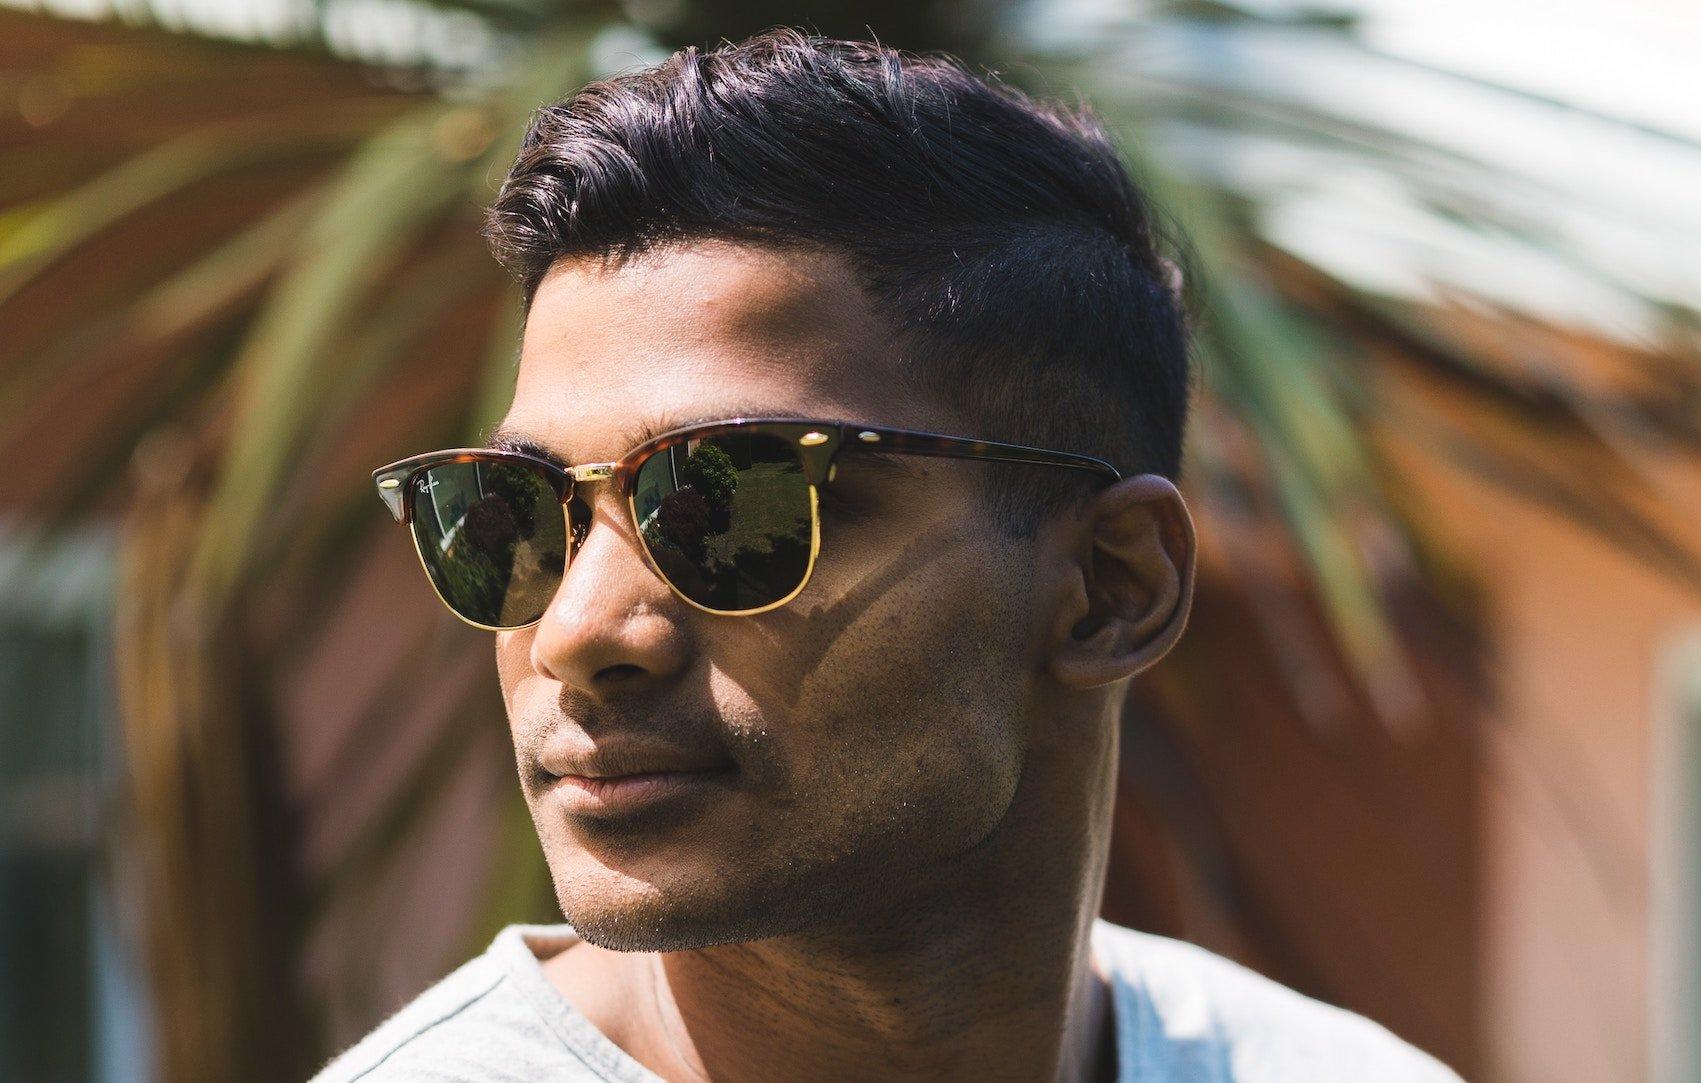 Does Hair Restoration Look Natural?